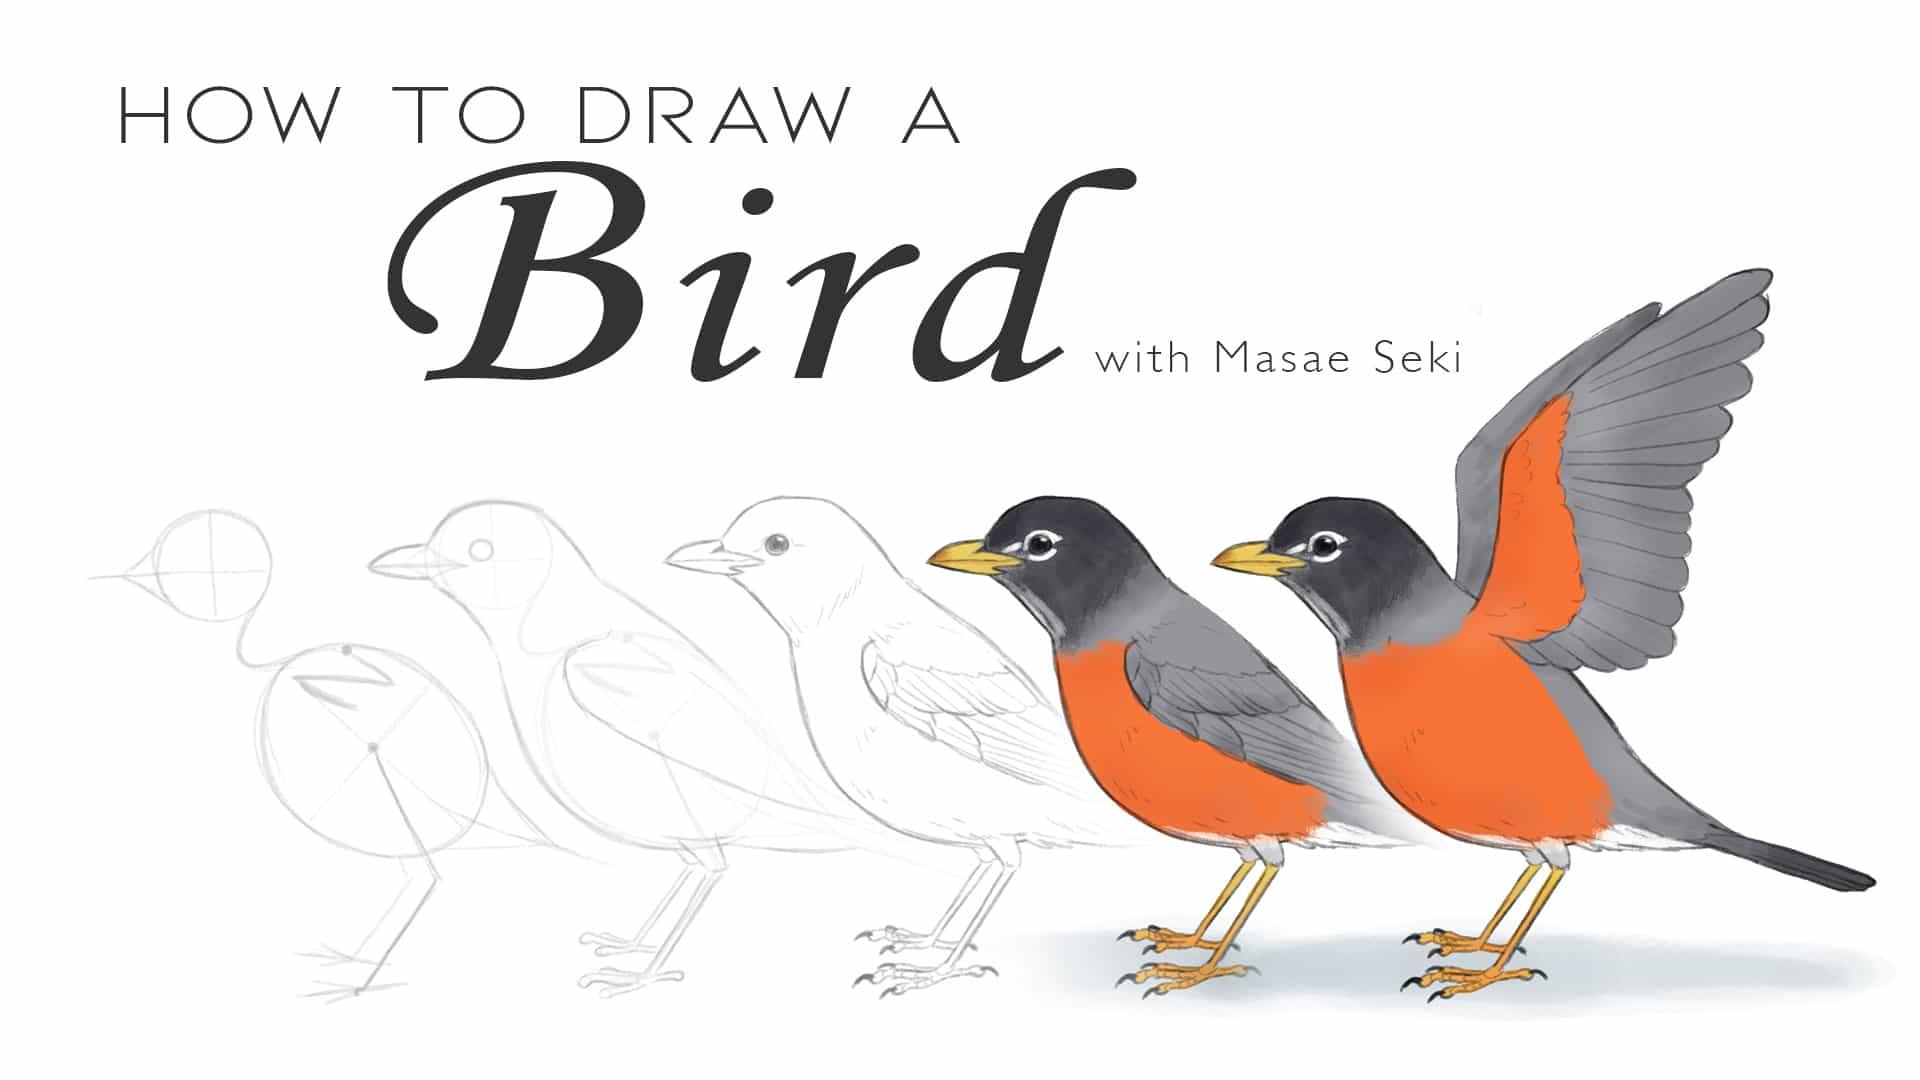 Cómo dibujar un pájaro